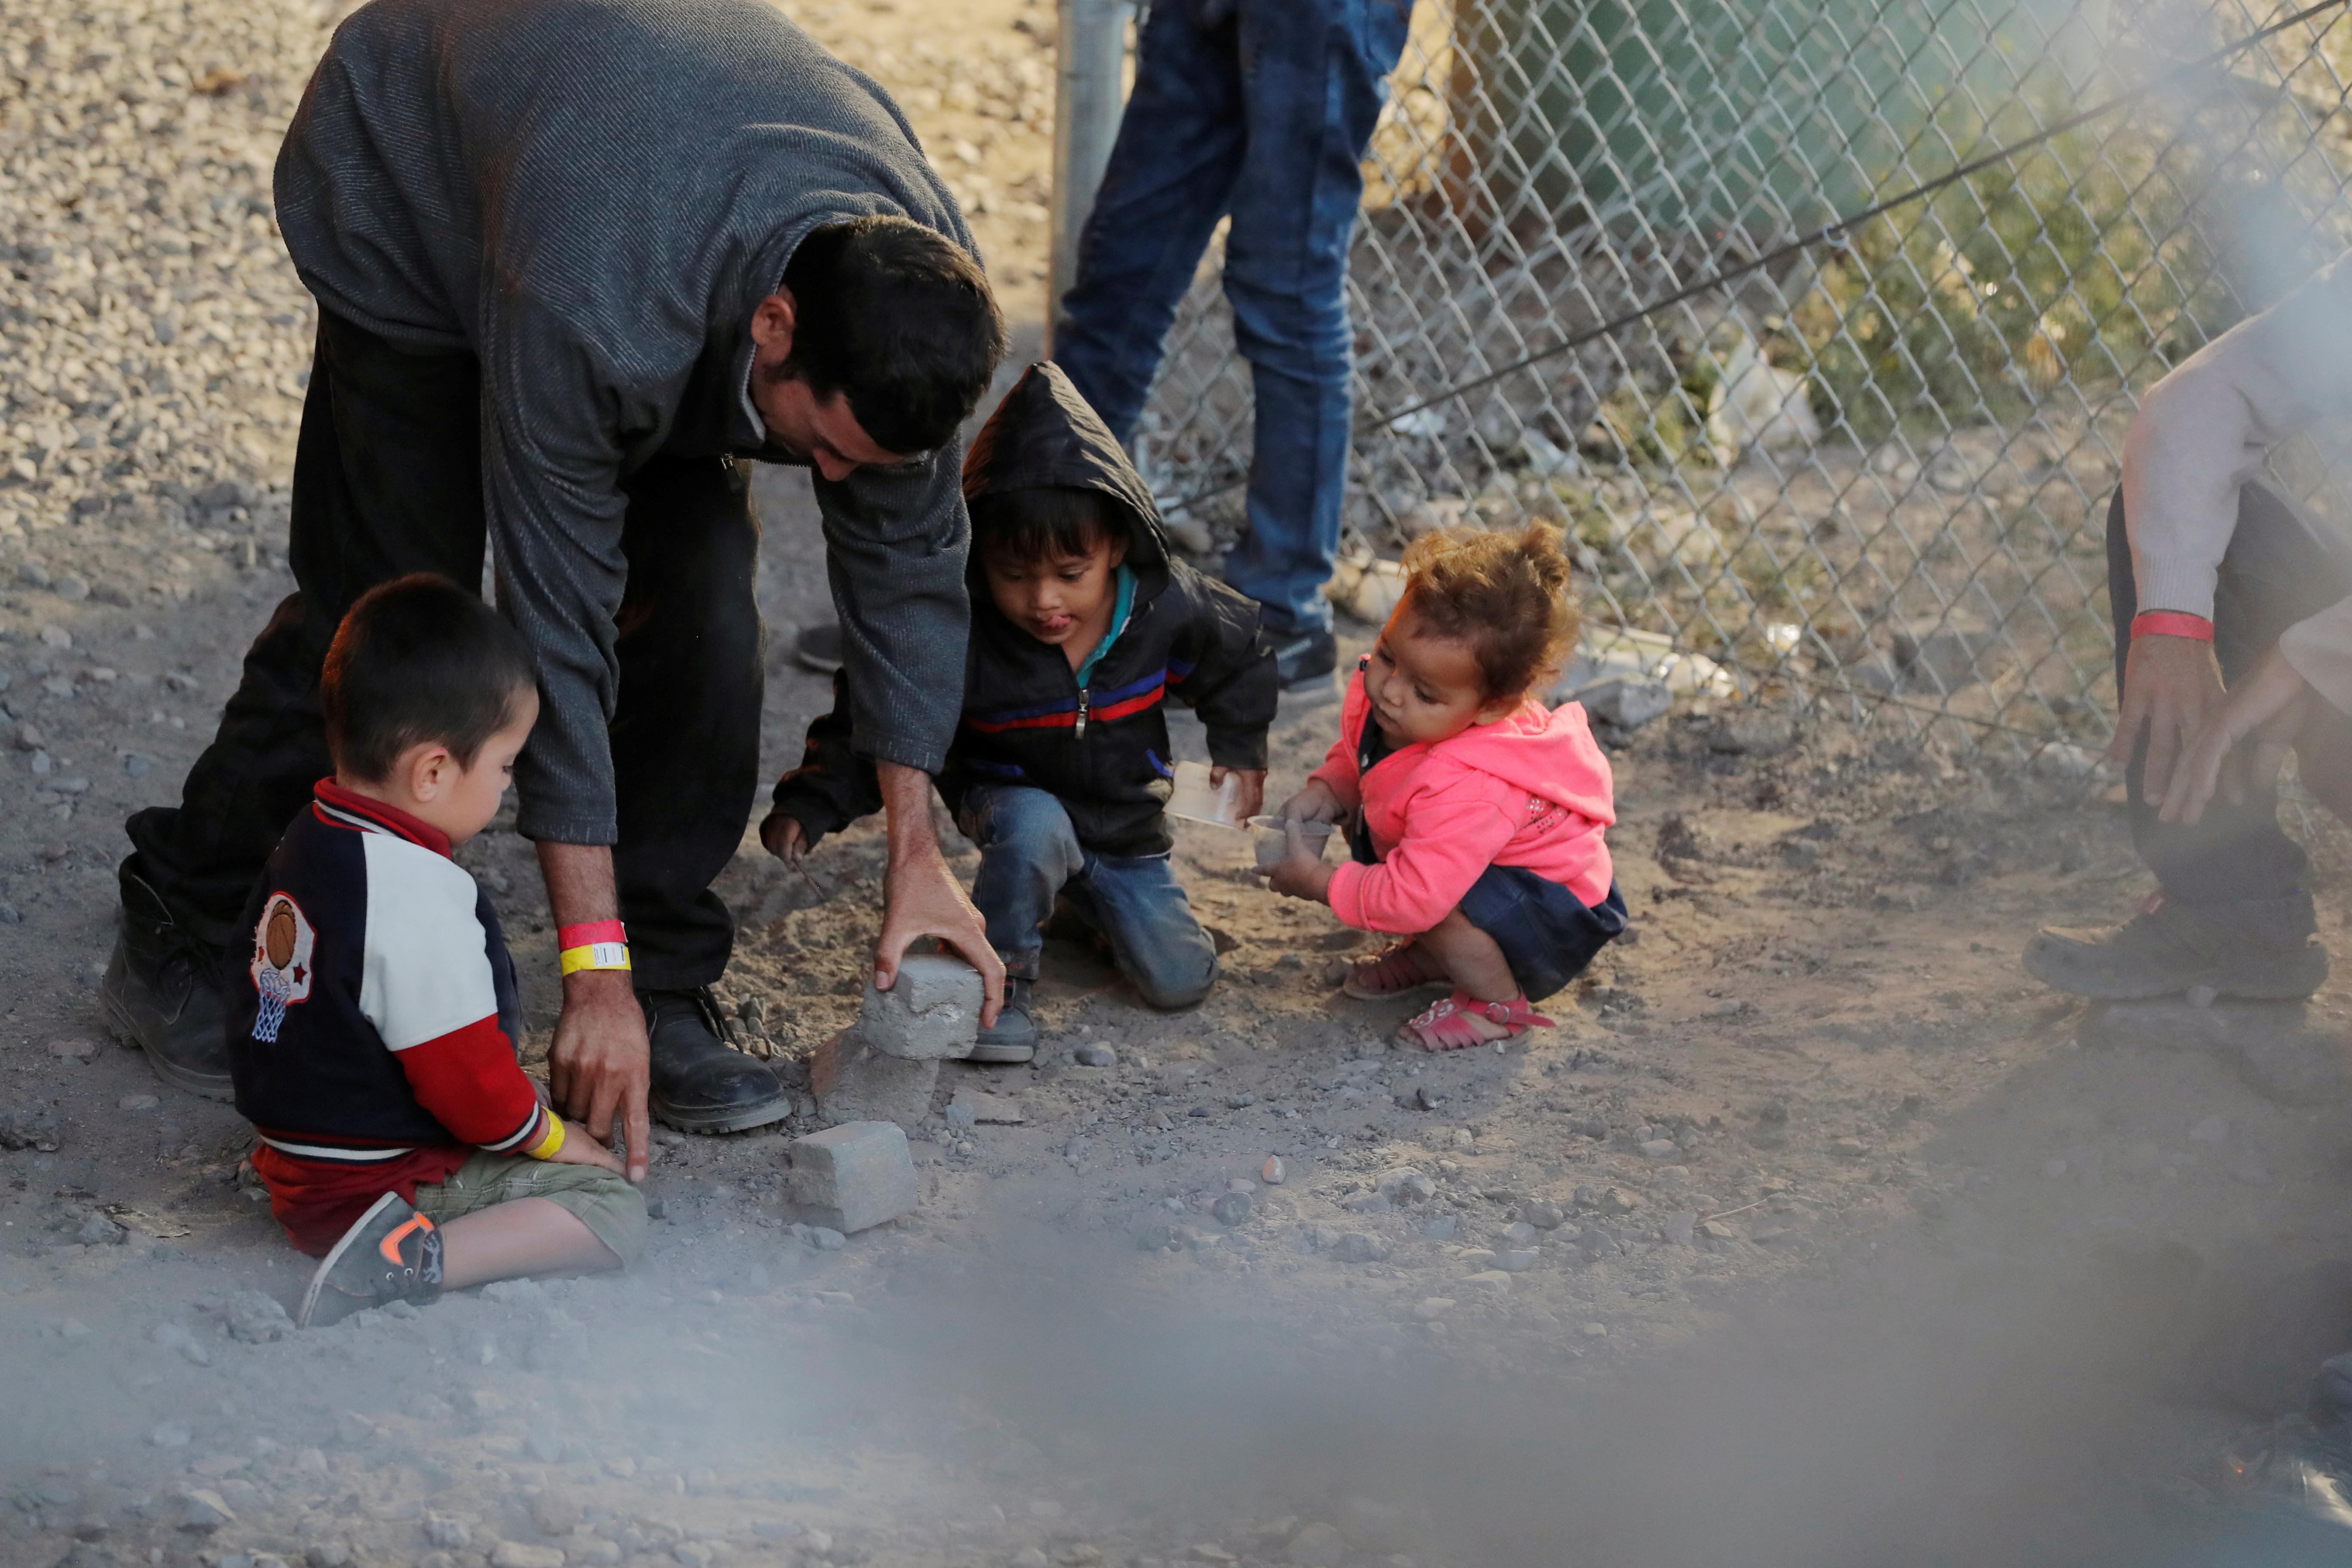 CBP spending $37 million on immigrant tent cities